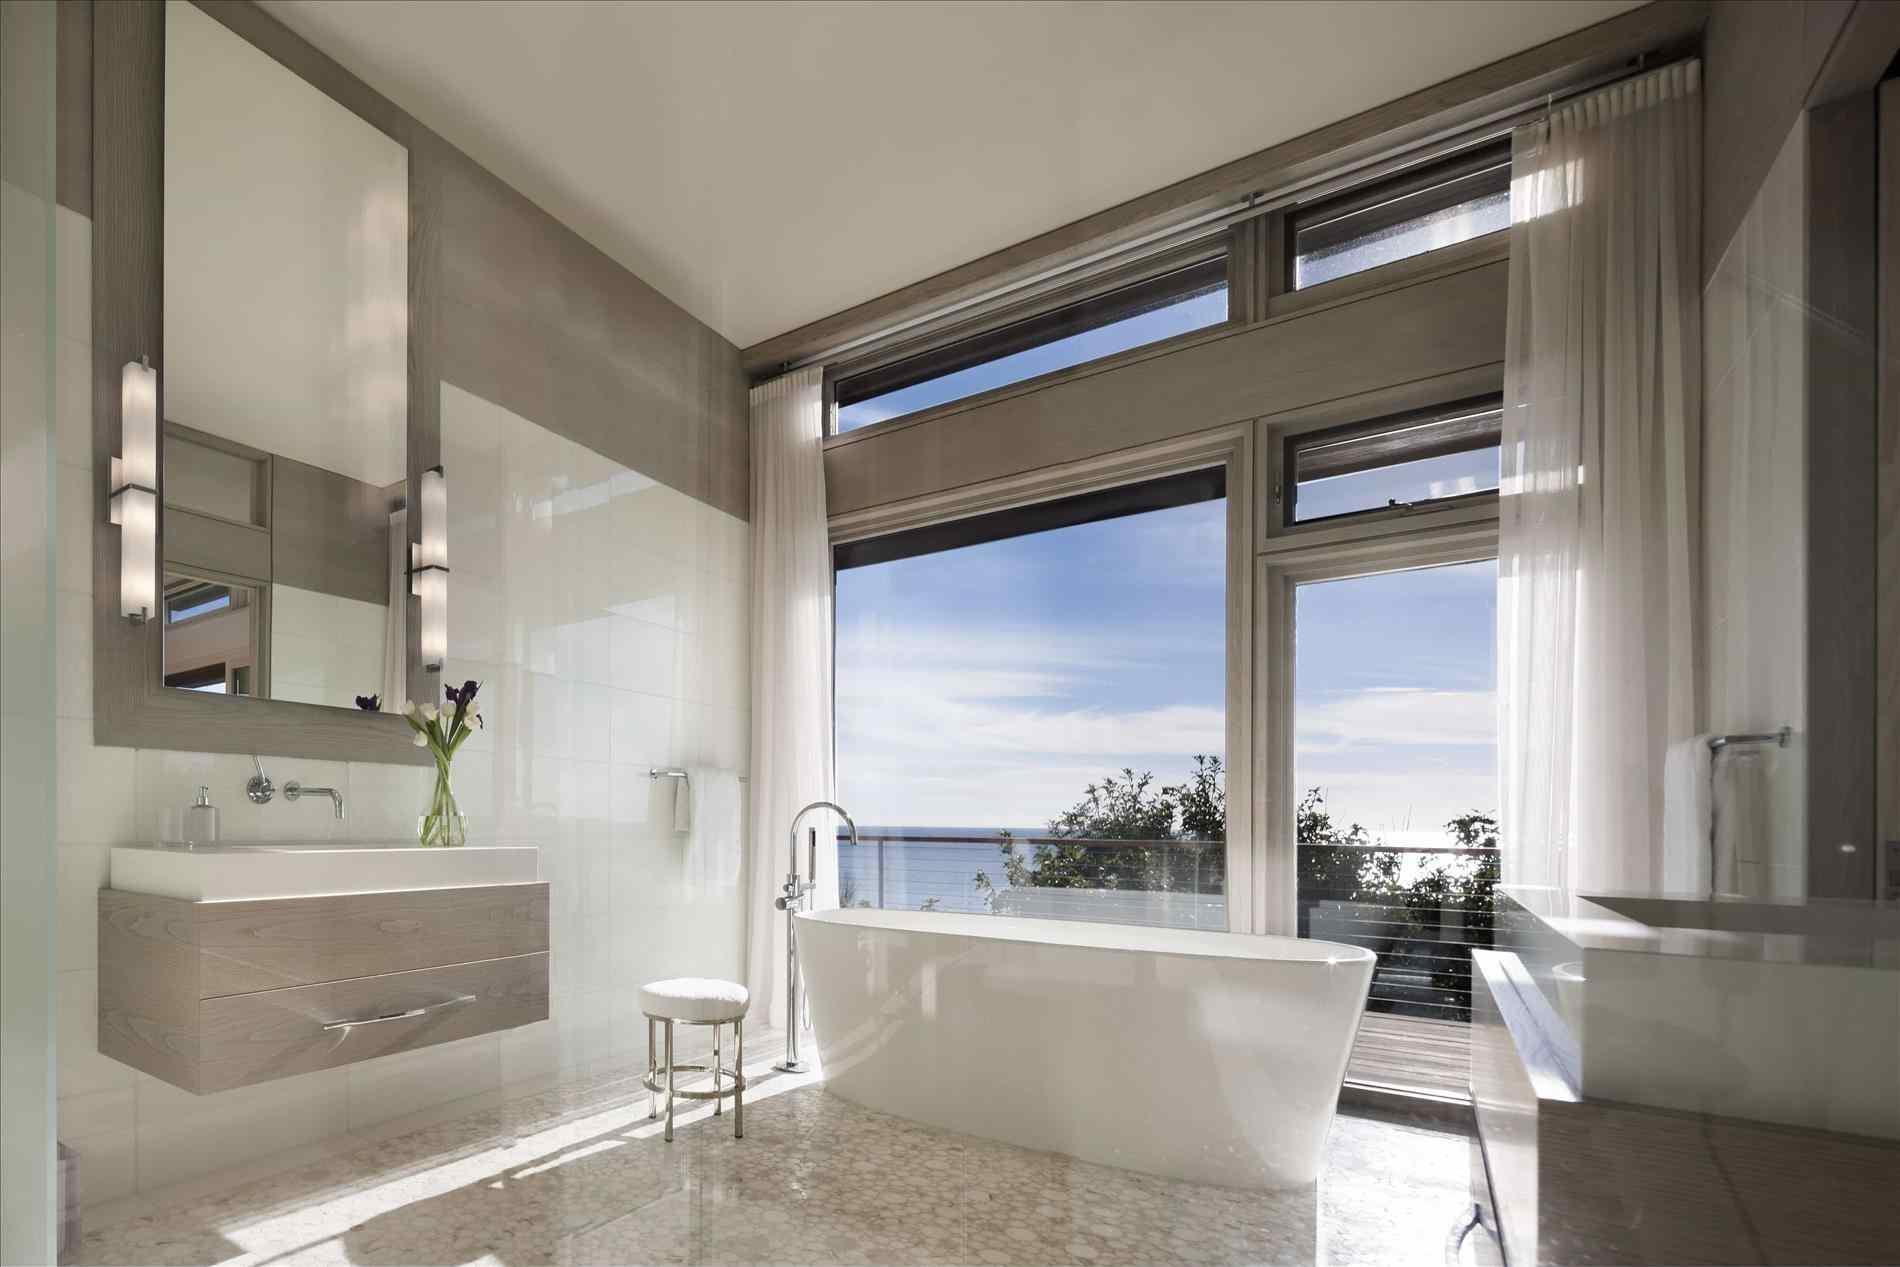 Perfekt ljus badrum